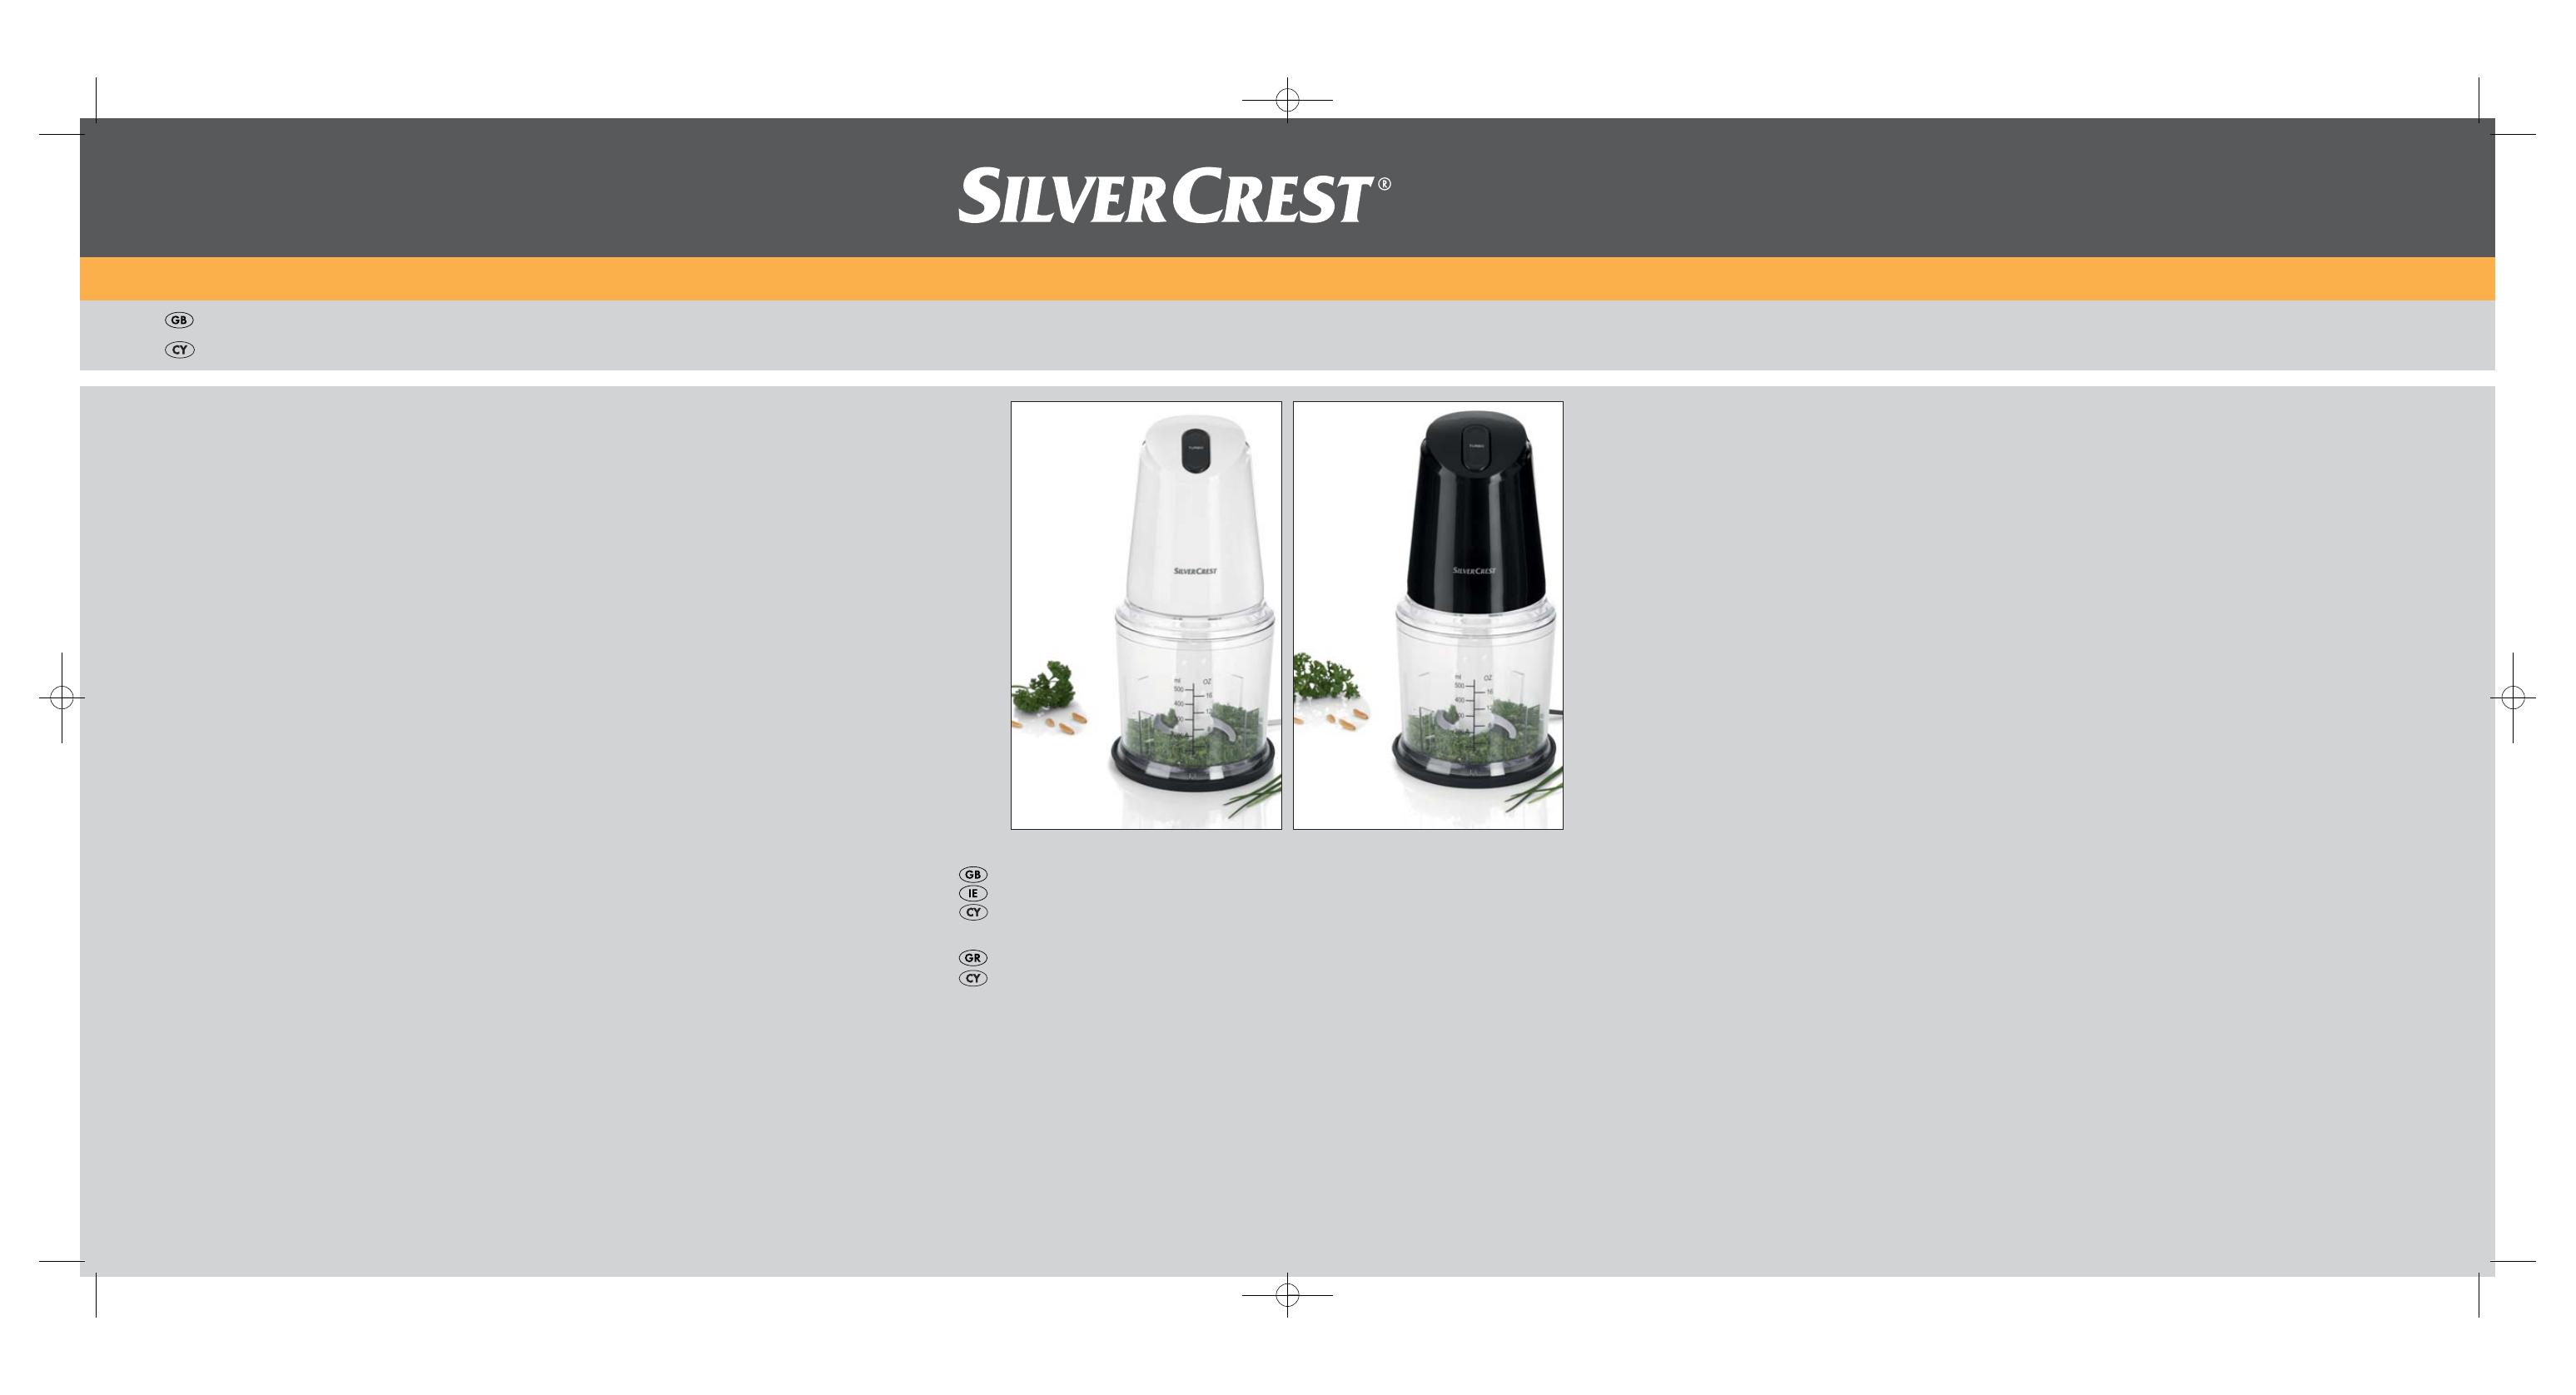 Silvercrest SMZ 260 B1 User Manual | 17 pages